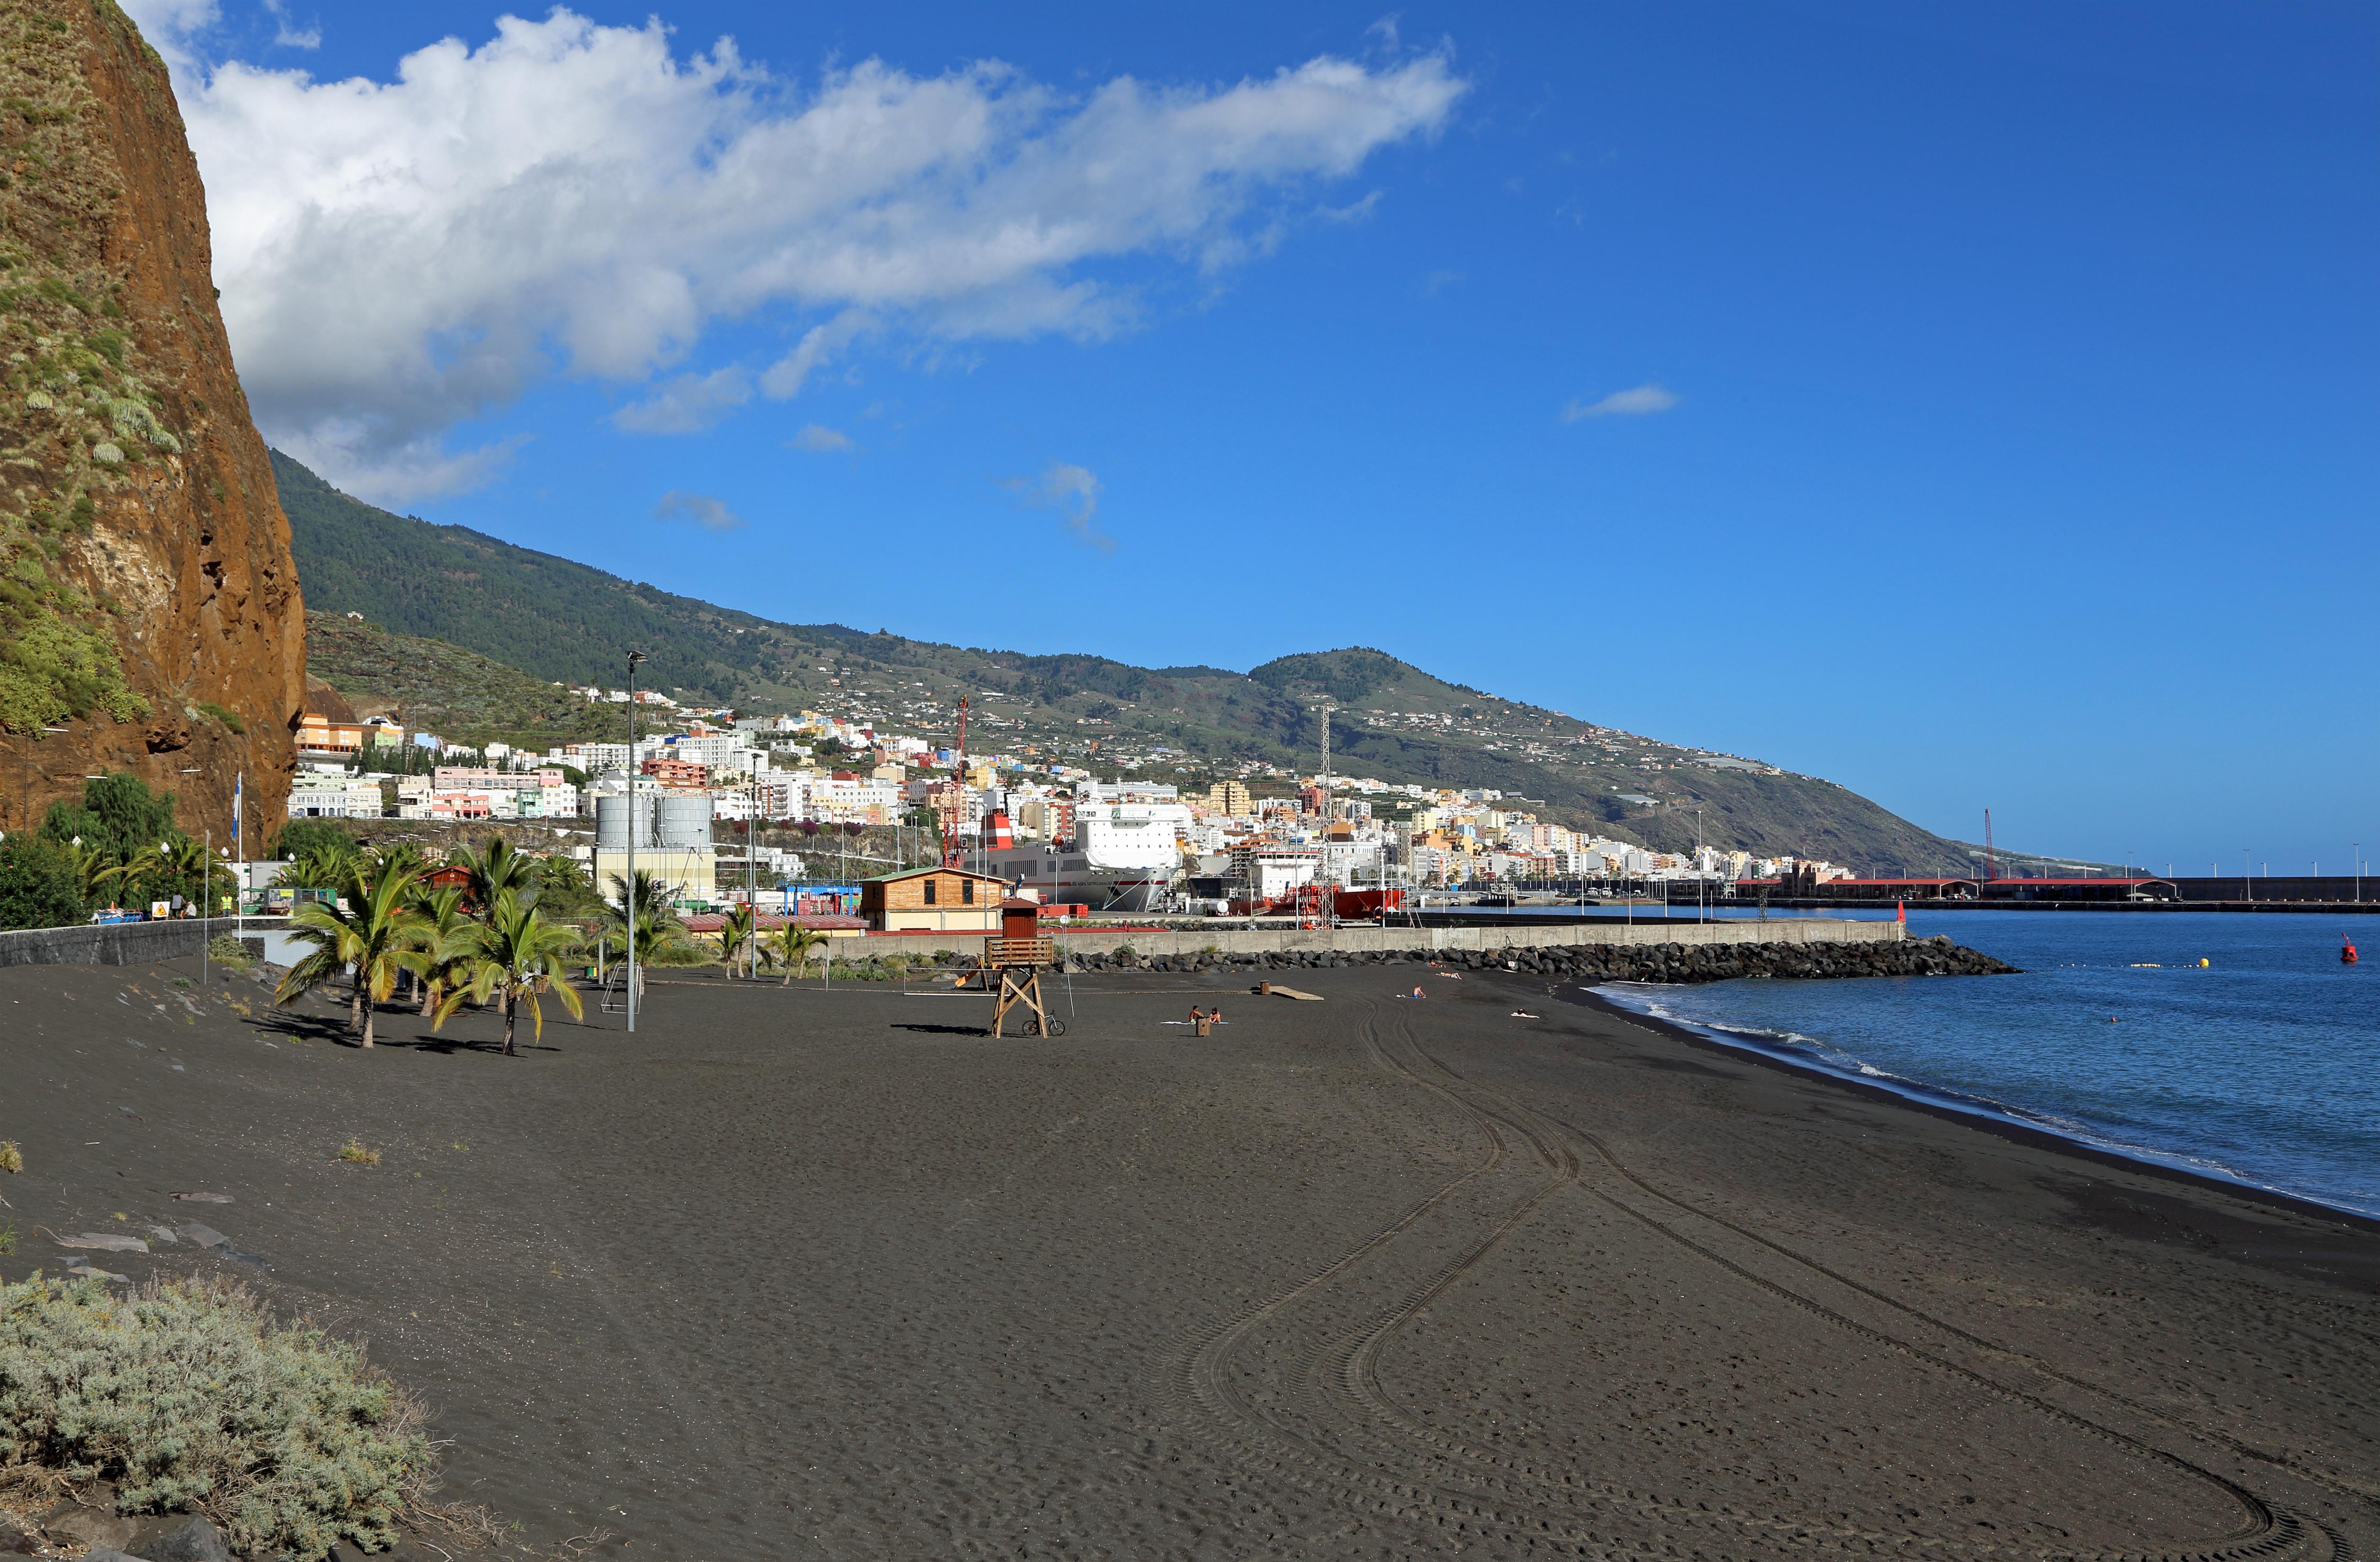 La_Palma_Playa_de_Bajamar_R02.jpg